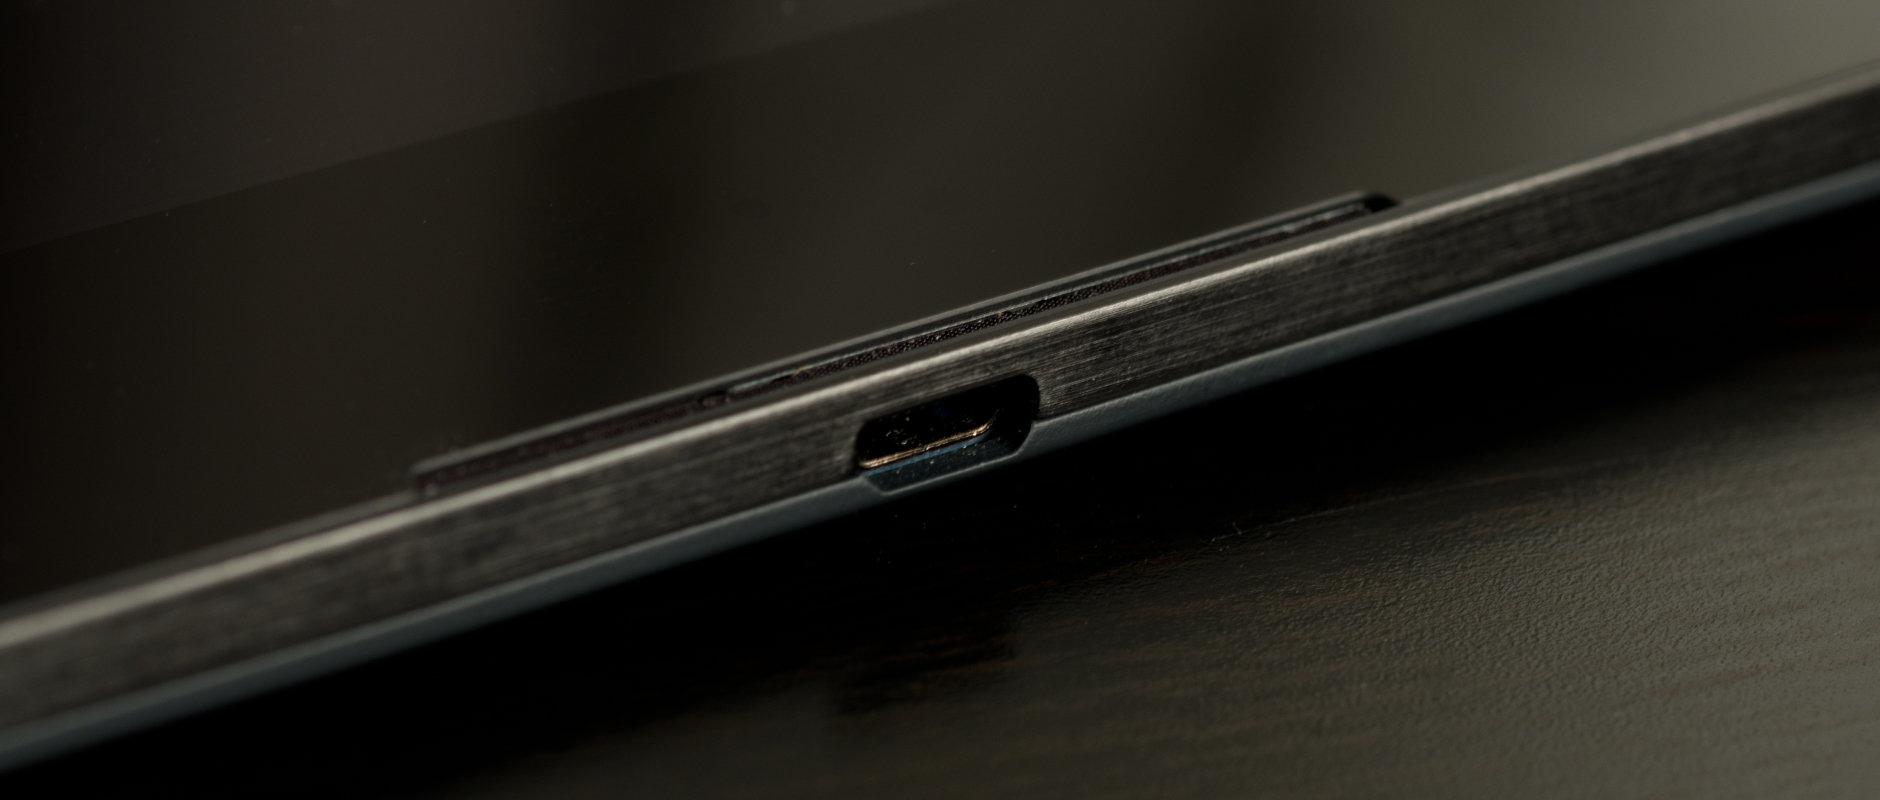 A photo of the Google Nexus 9's microUSB port.